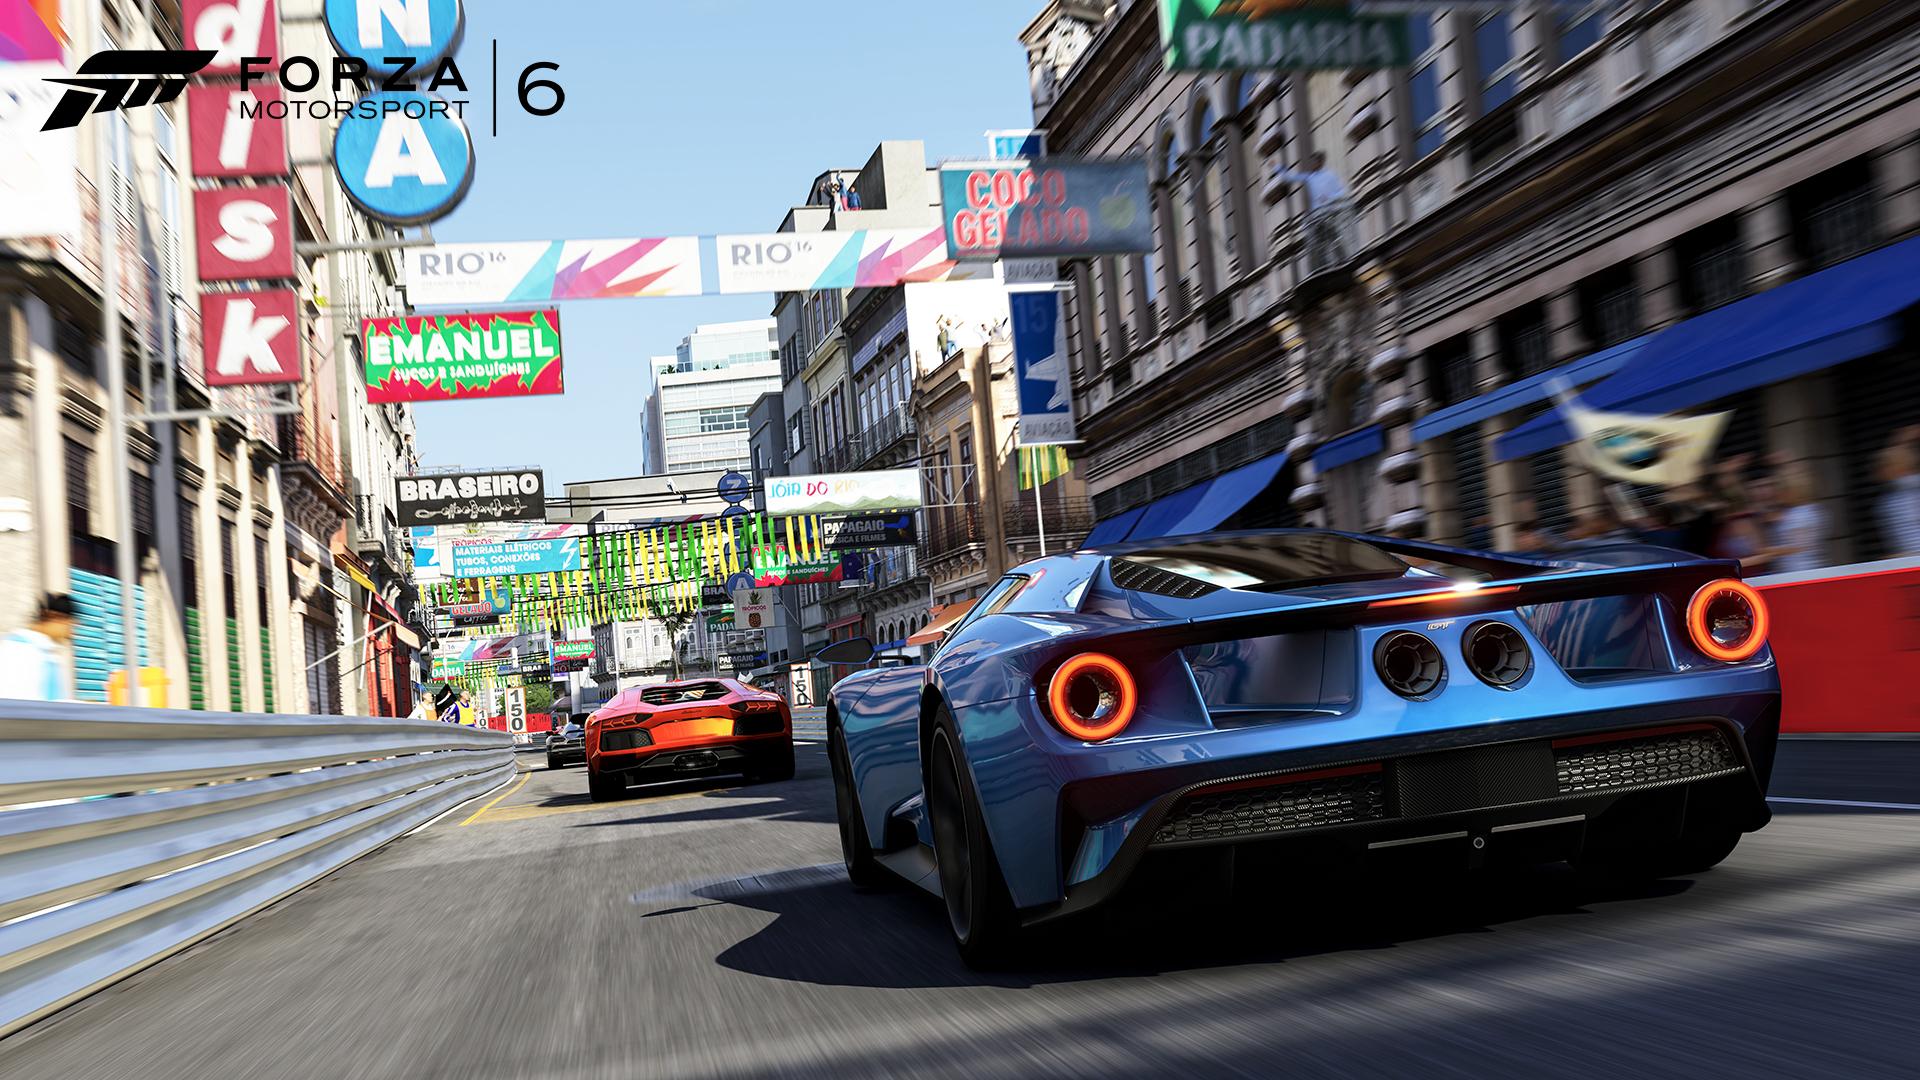 The new Rio track in Forza Motorsport 6